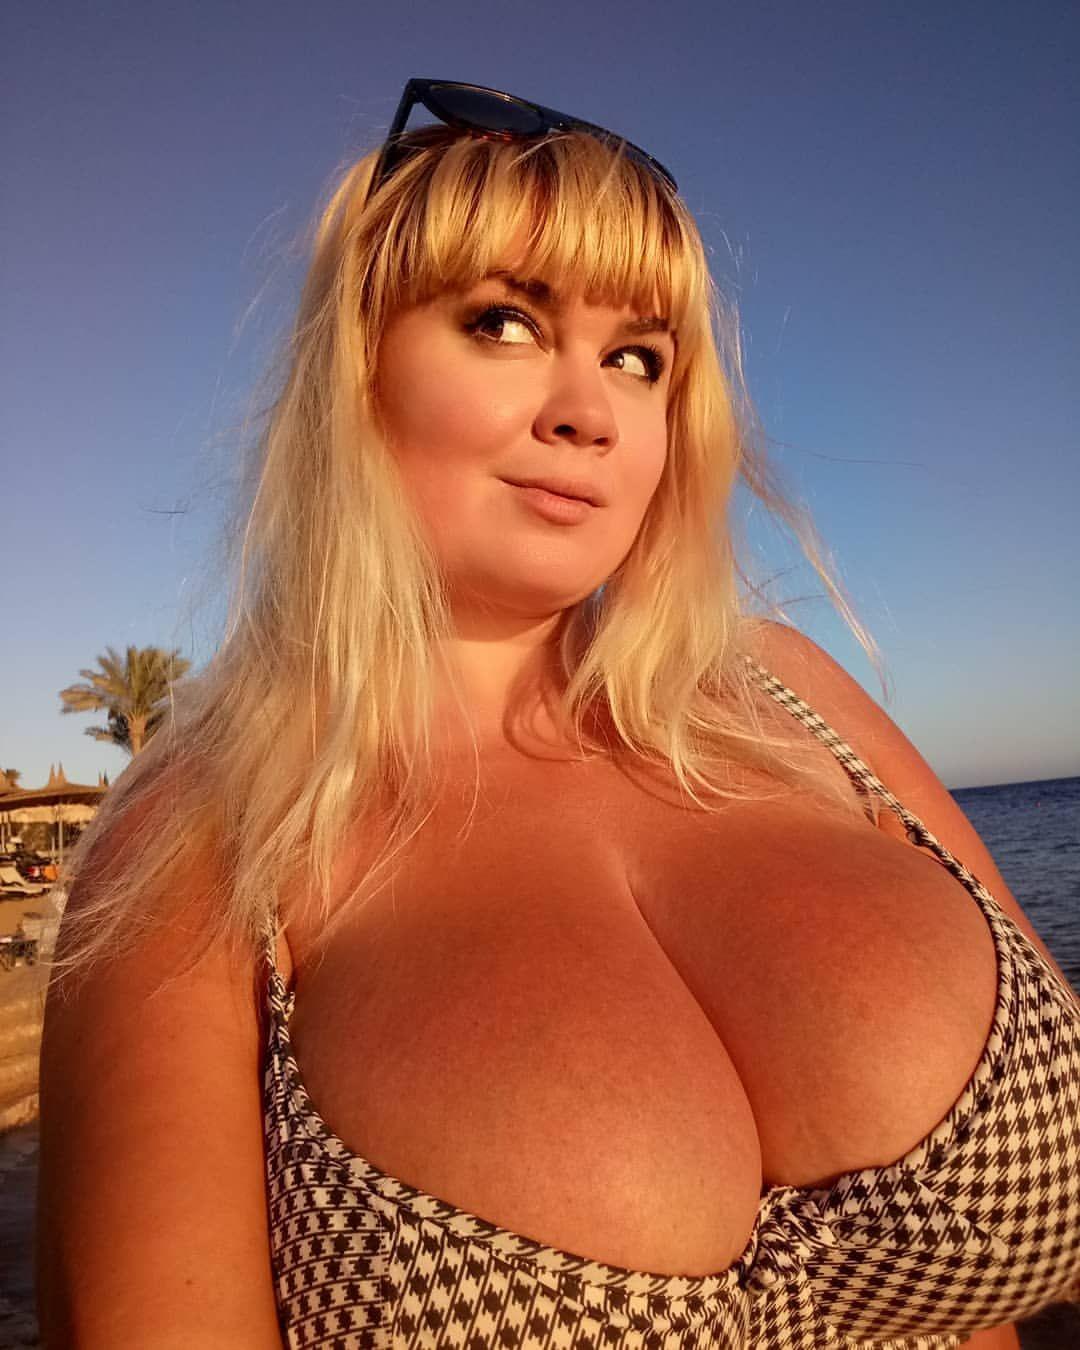 Vicky pattison in bikini photo